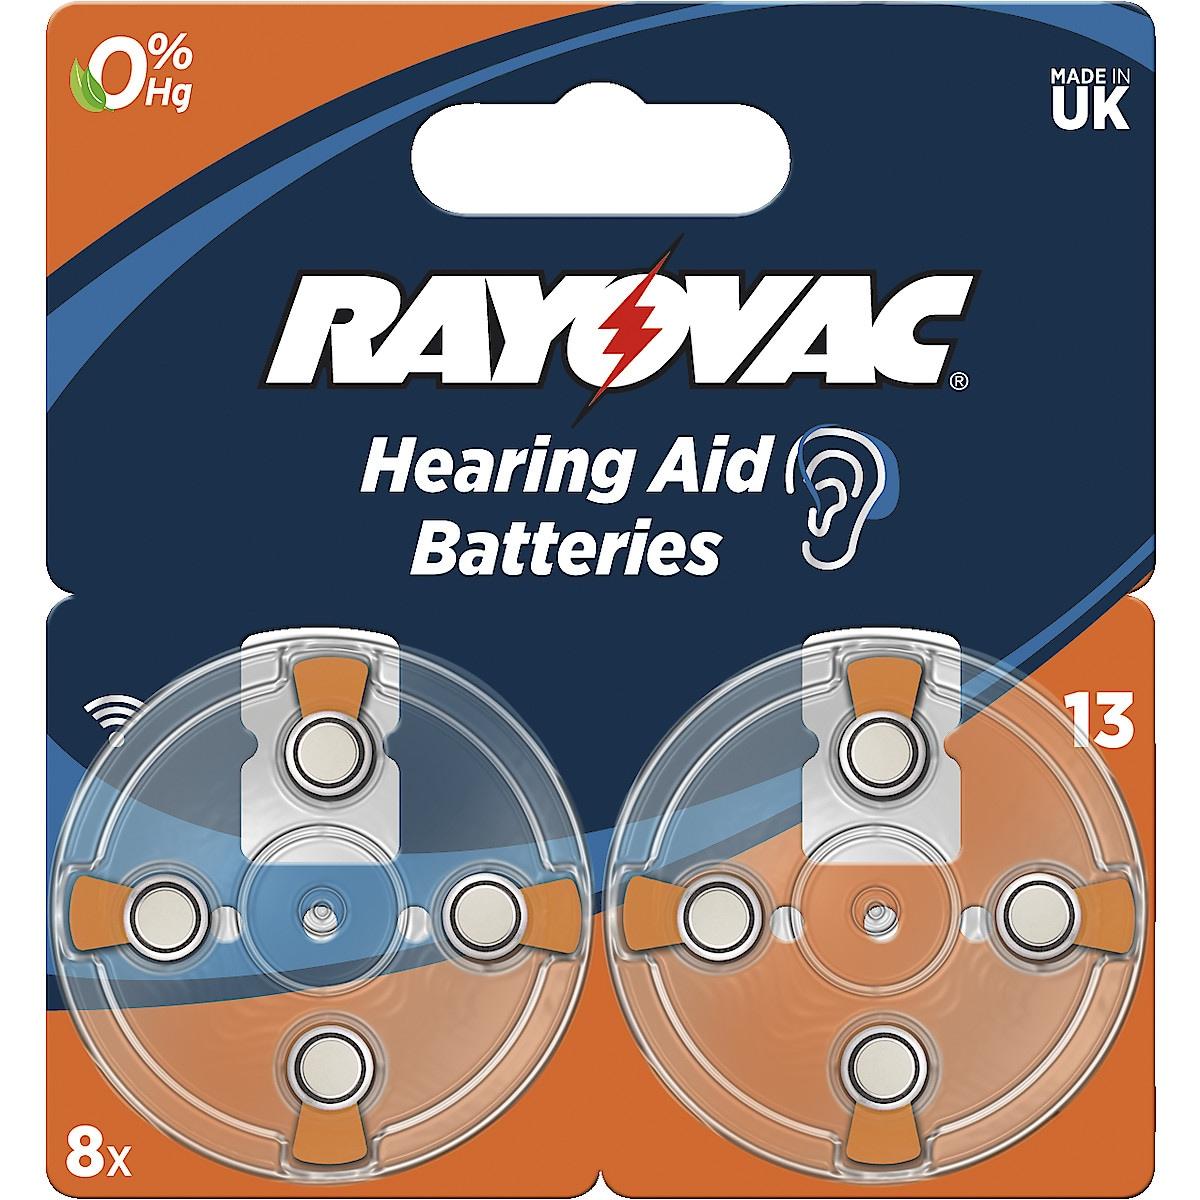 Rayovac 13 høreapparatbatteri